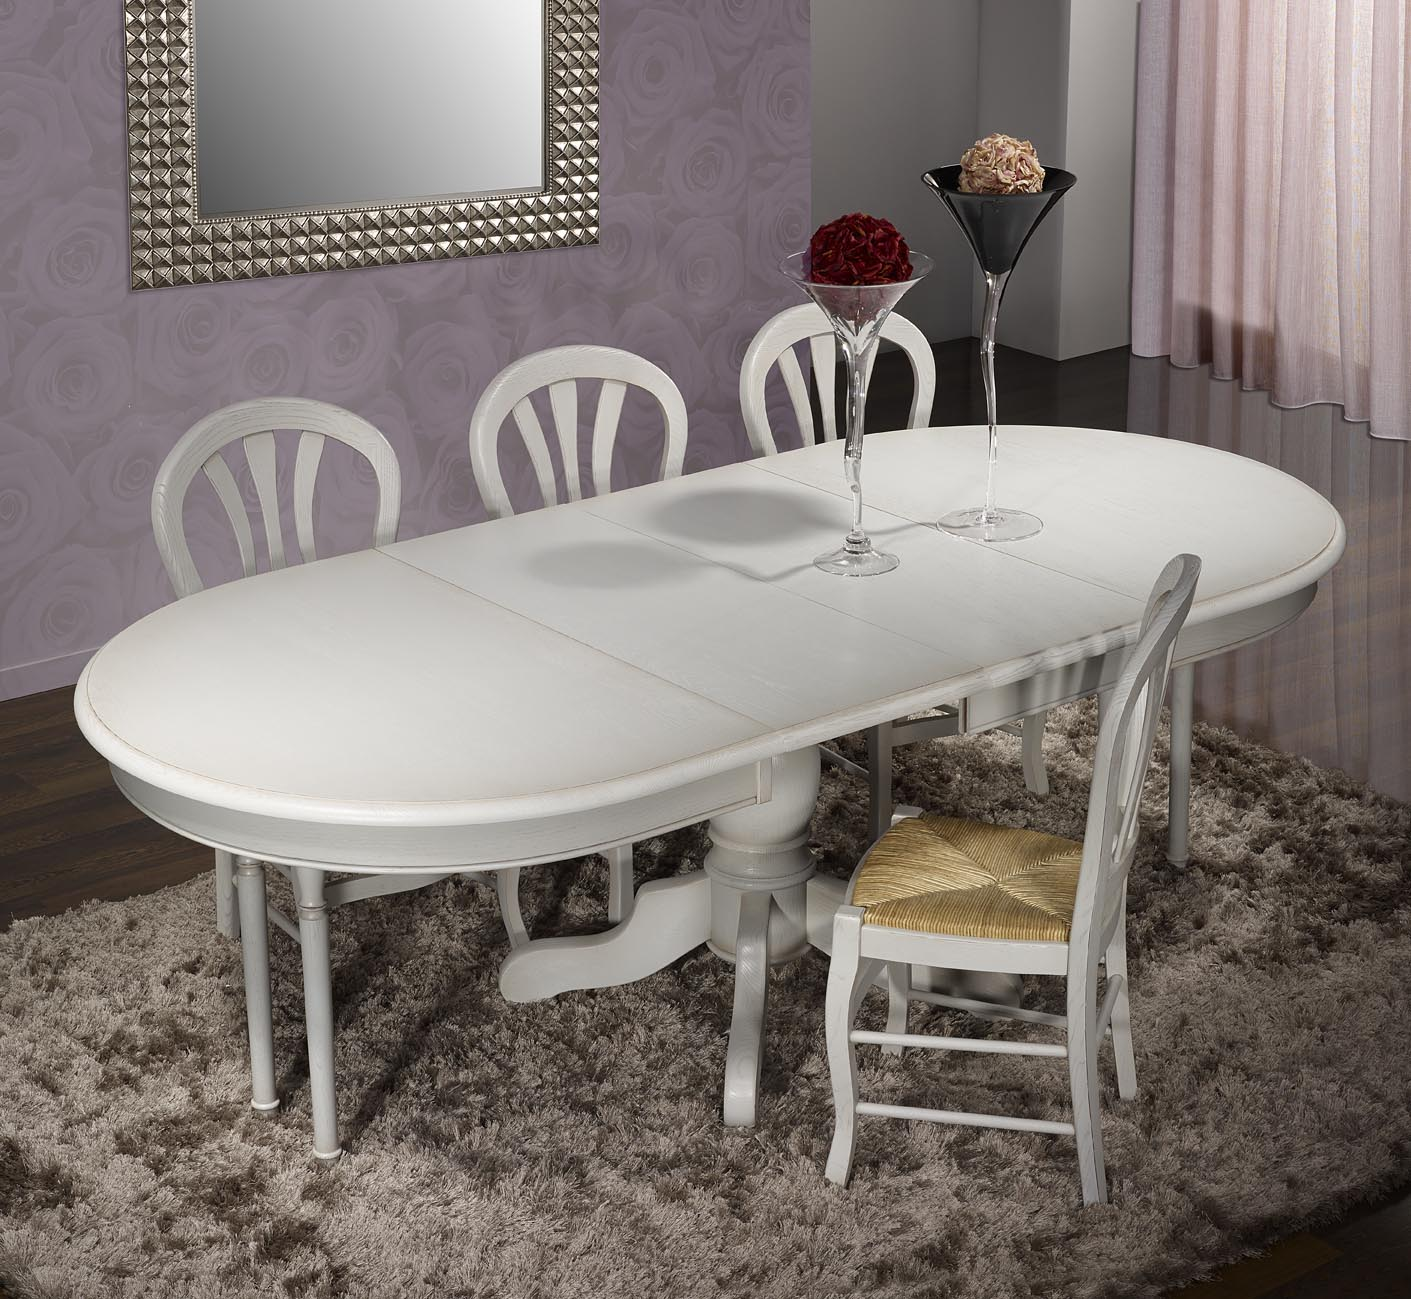 table ovale pied central romain en ch ne massif de style louis philippe 150x110 finition ch ne. Black Bedroom Furniture Sets. Home Design Ideas